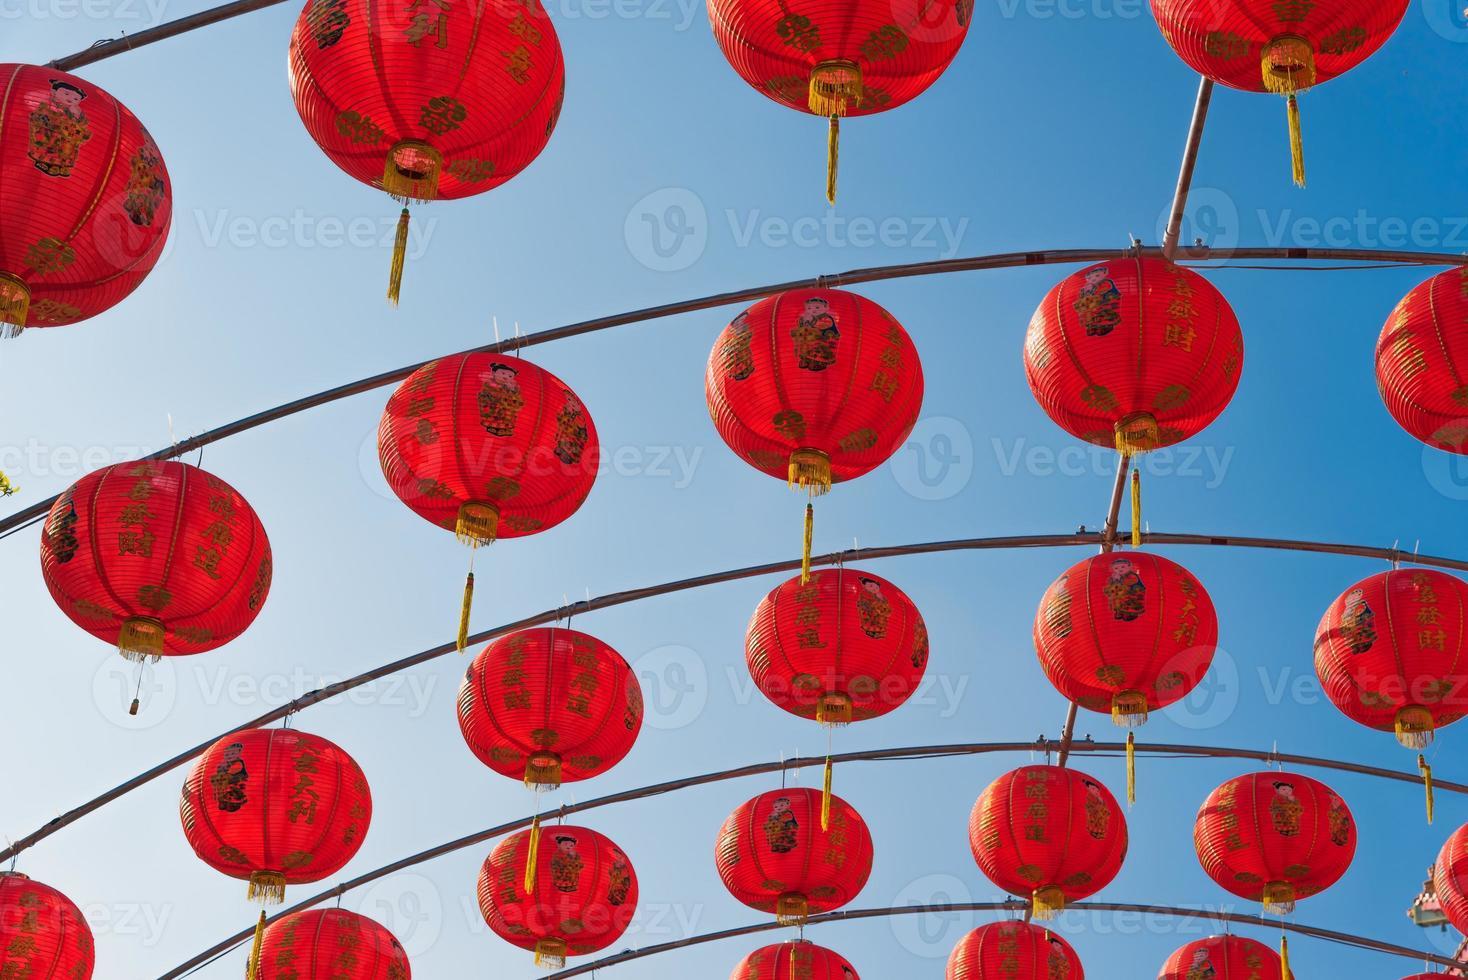 chinesische rote Laternen foto